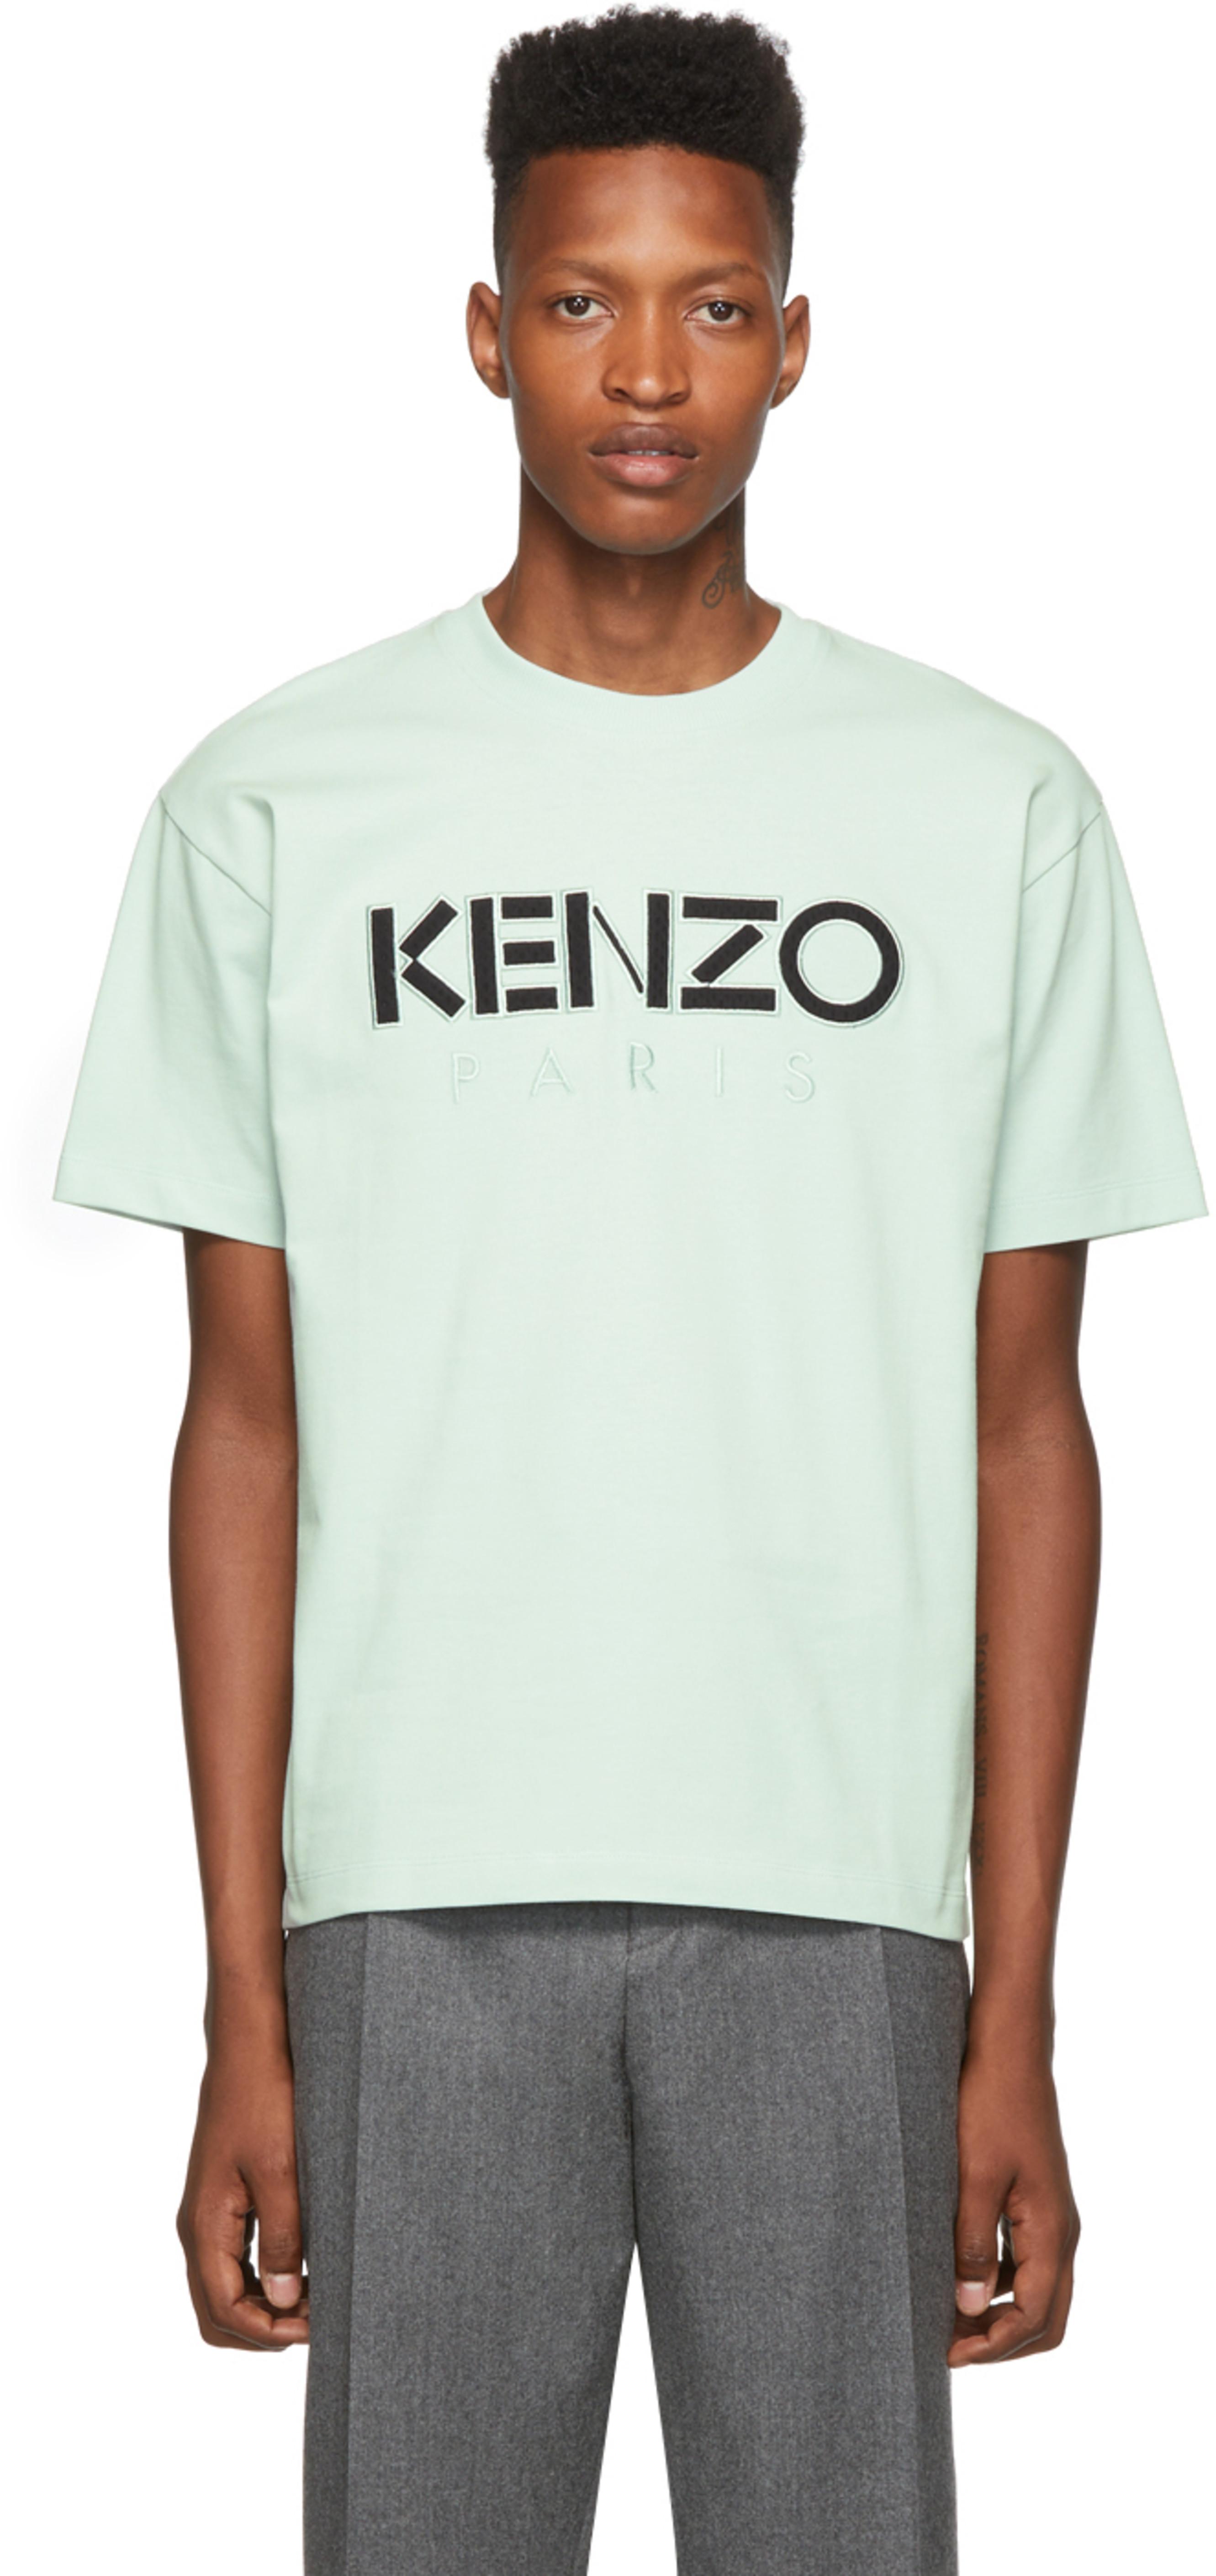 1f0d0d748e48 Kenzo for Men FW19 Collection | SSENSE